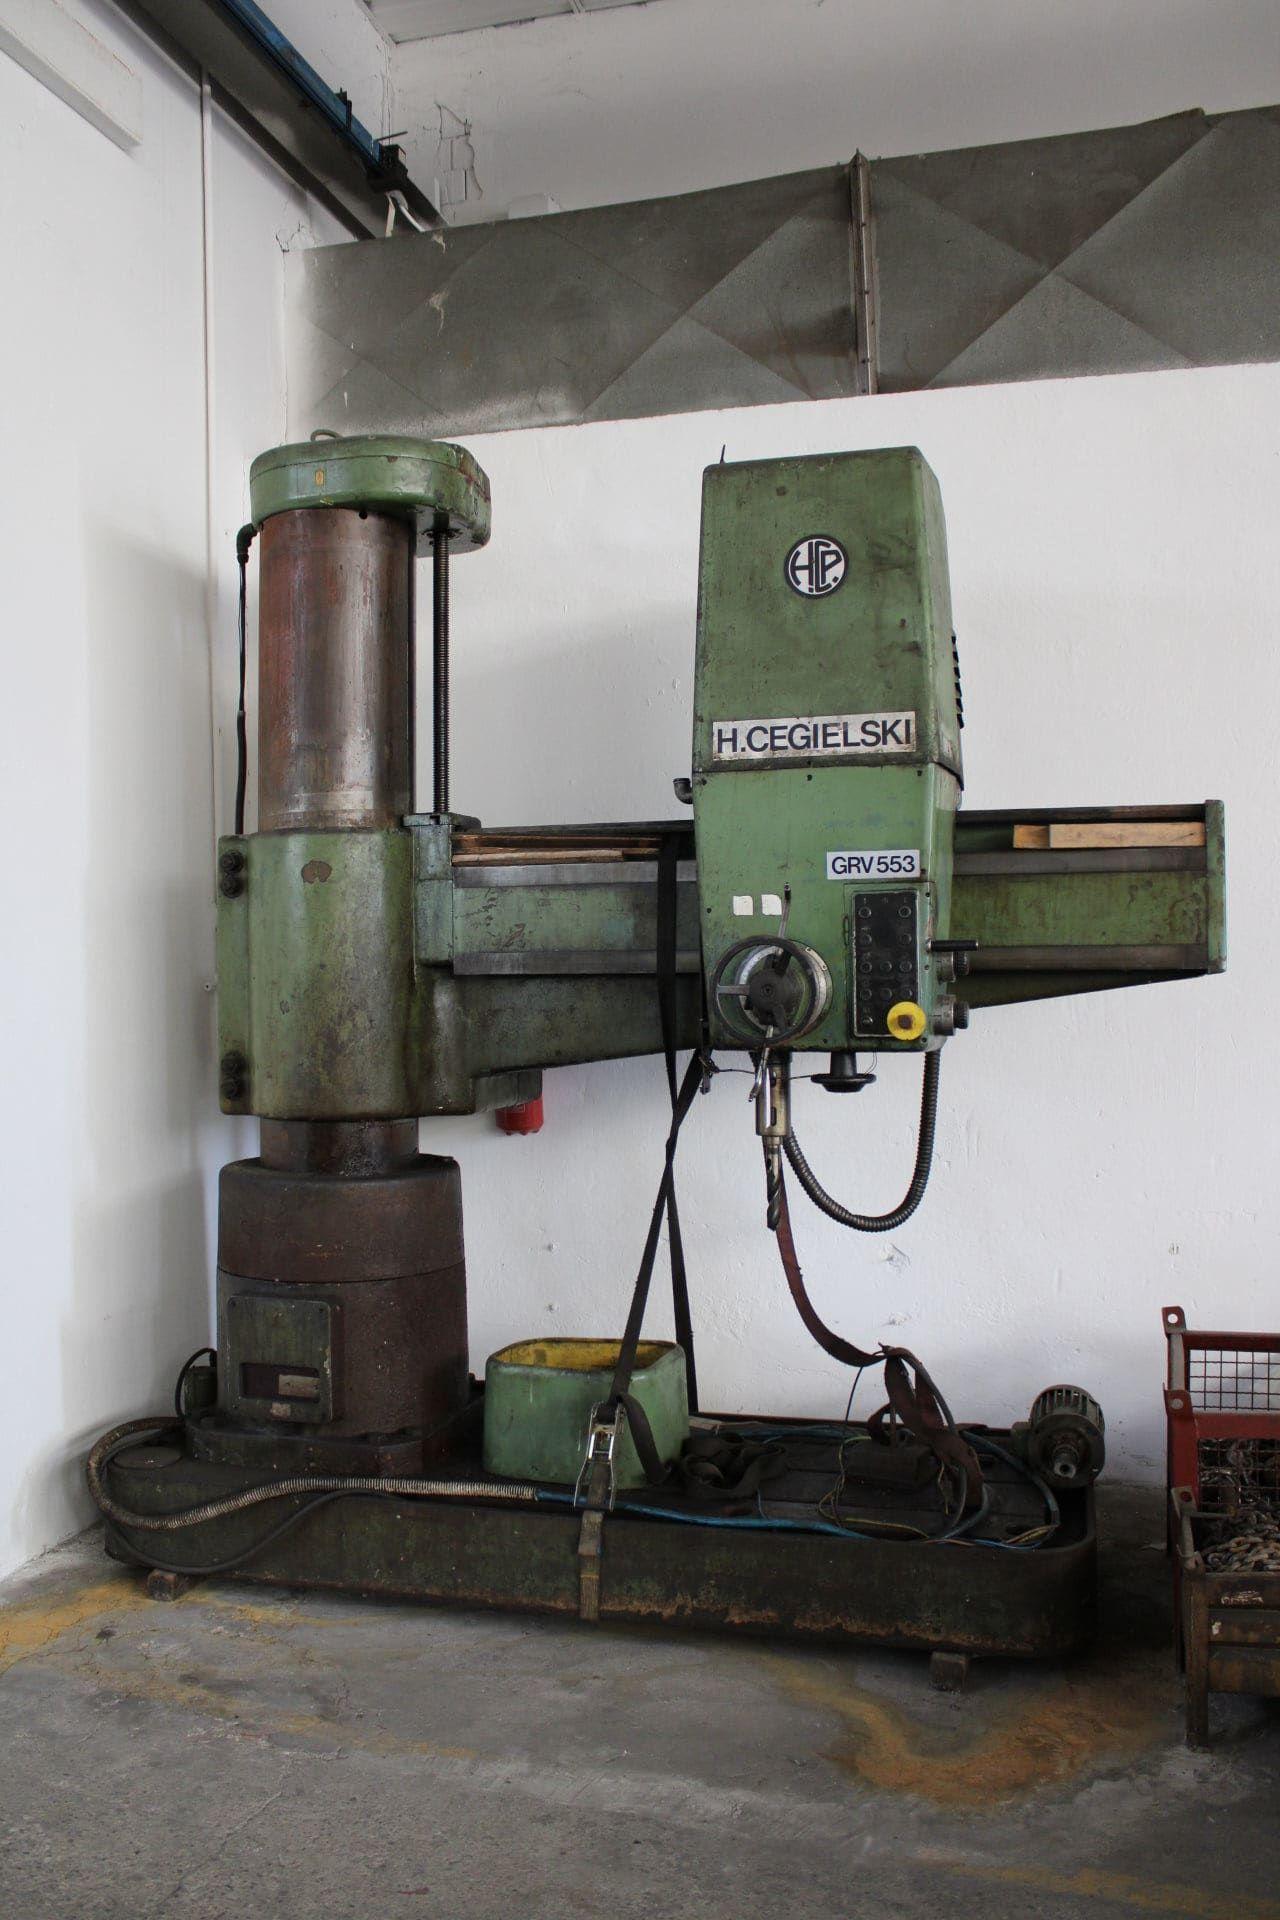 H.CEGIELSKI GRV 553 Radialbohrmaschine